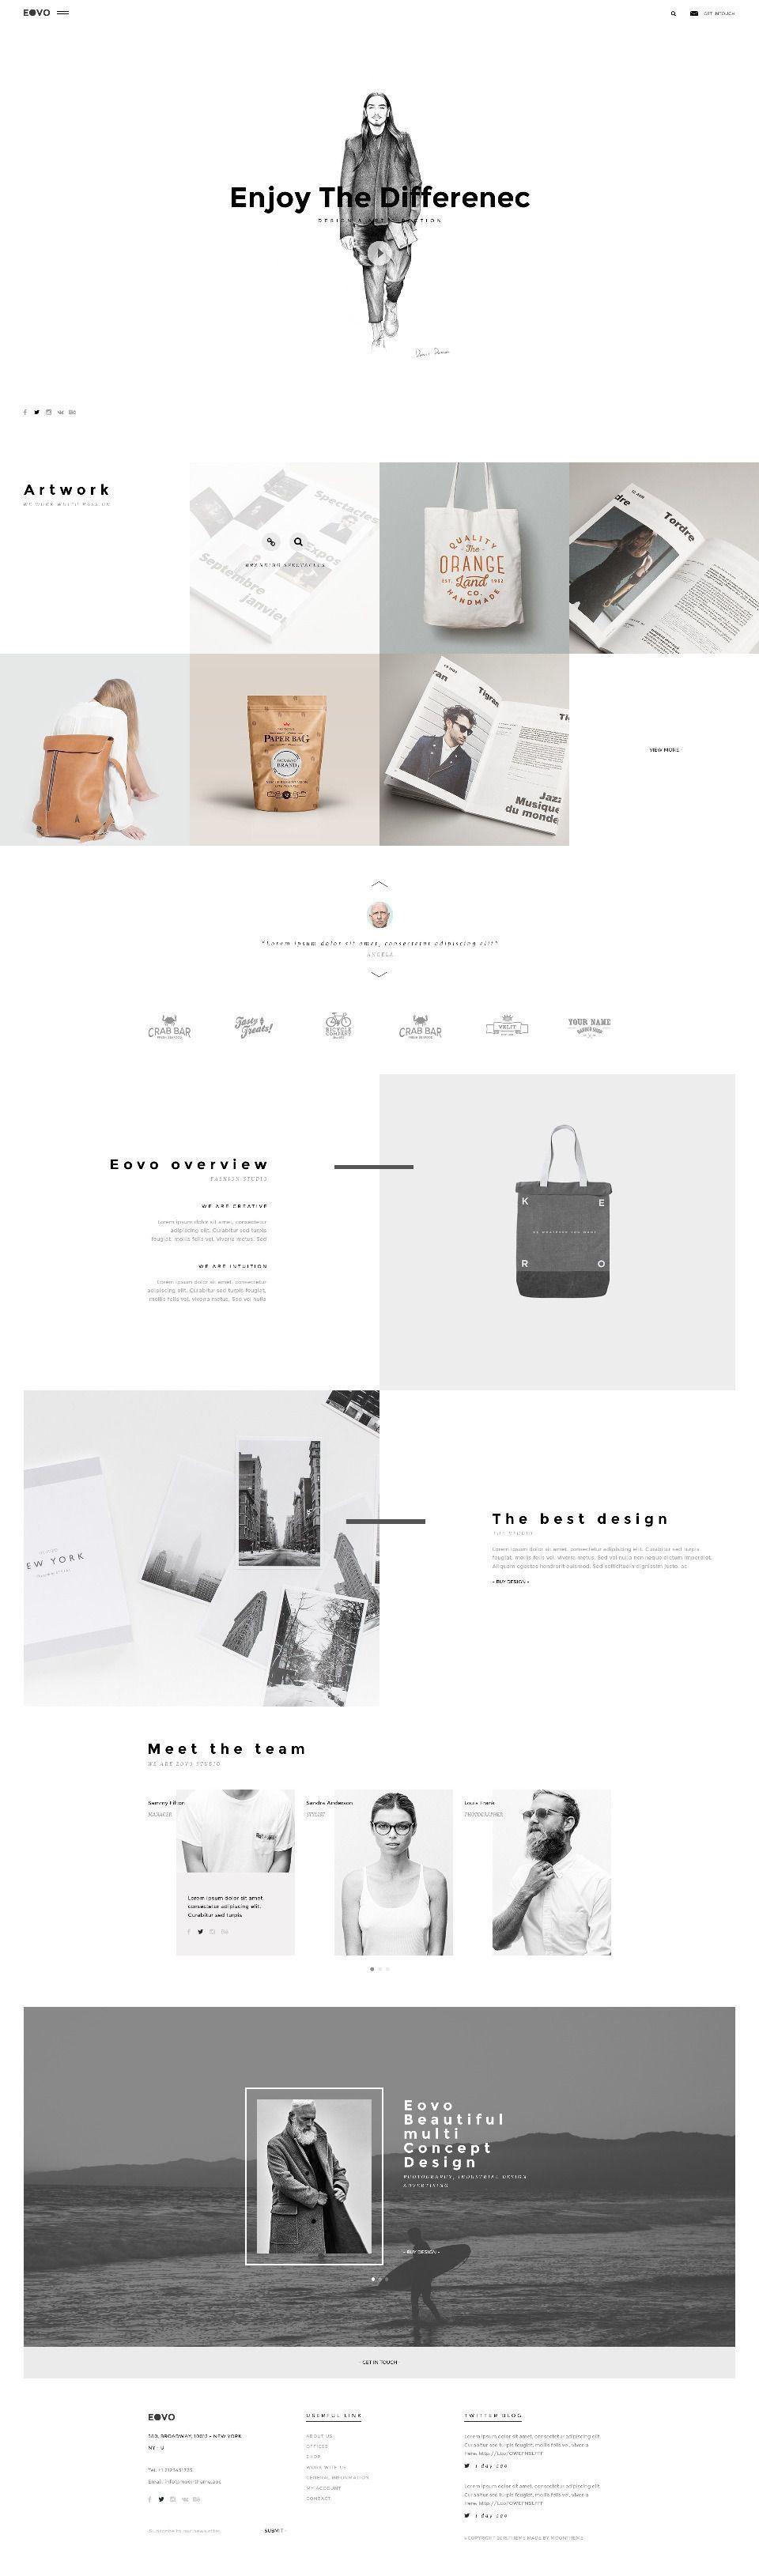 Siteoutsite Com Web Design Trends Web Layout Design Web Design Tips